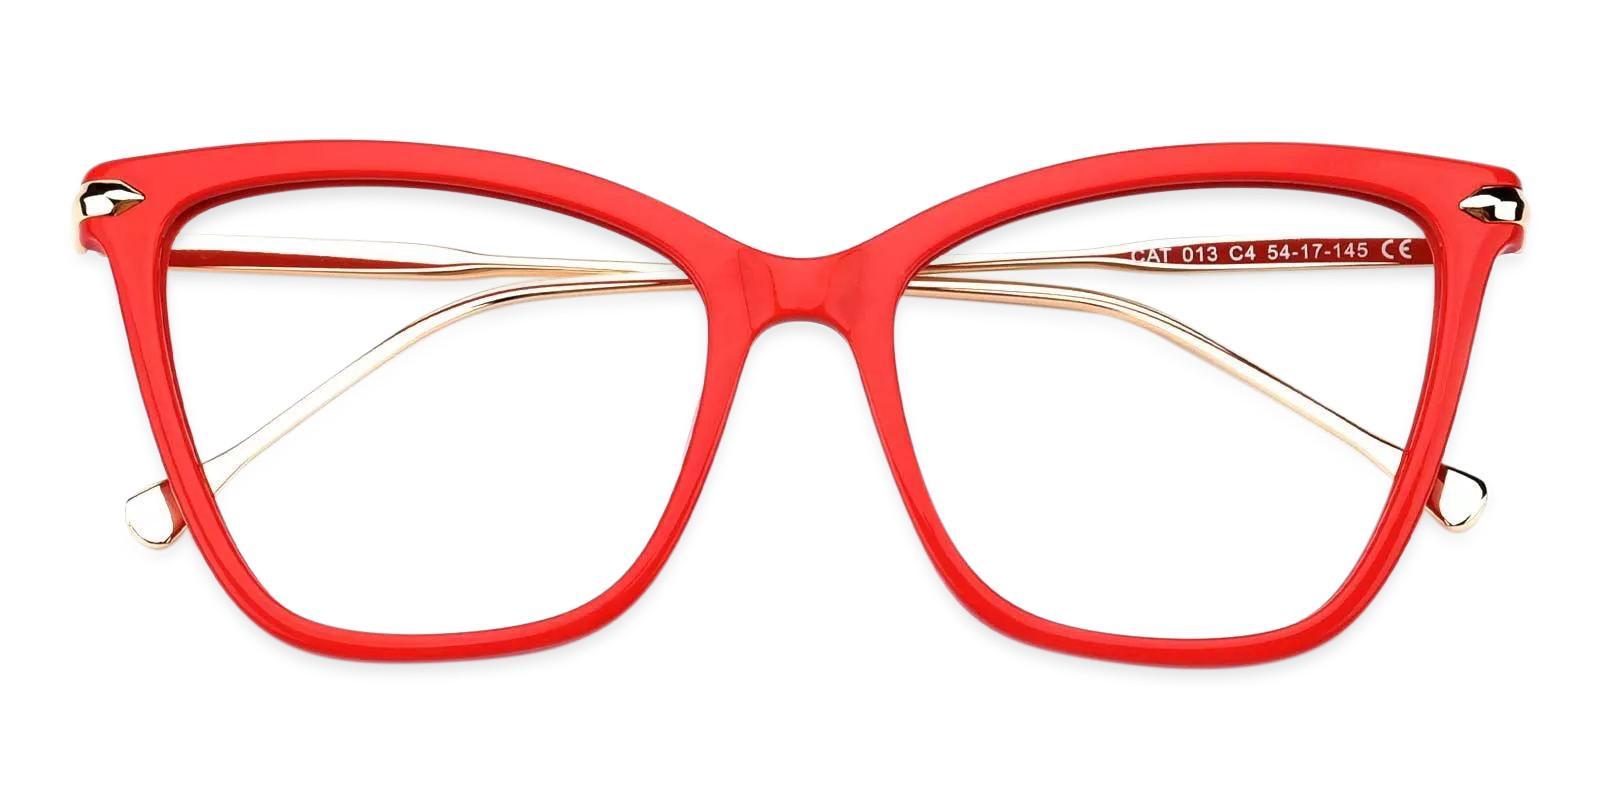 Gosse Red Acetate , Metal Eyeglasses , Fashion , UniversalBridgeFit Frames from ABBE Glasses